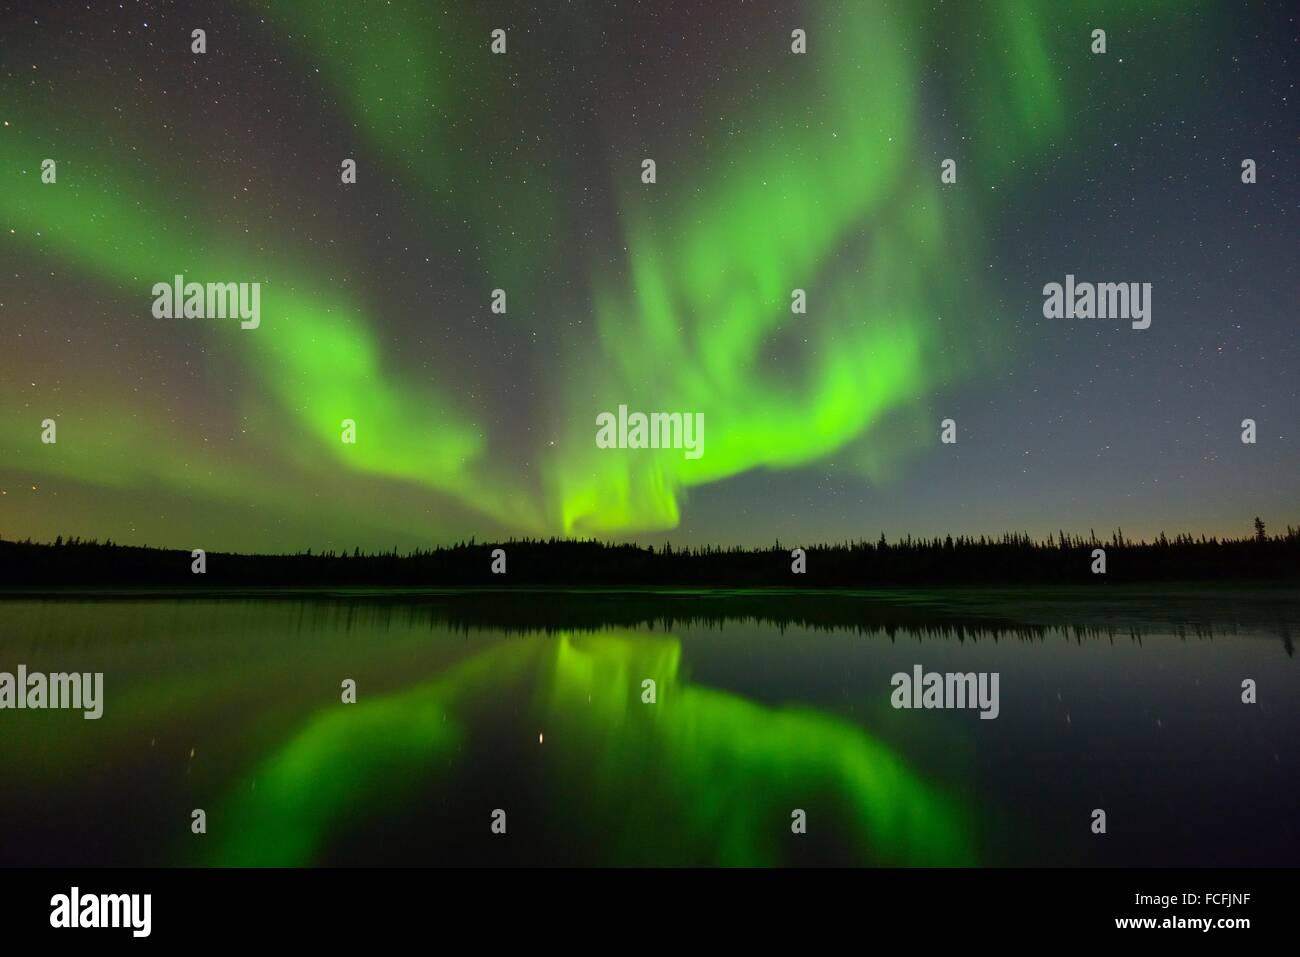 Aurora borealis over Prosperous Lake, Yellowknife, Northwest Territories, Canada. - Stock Image